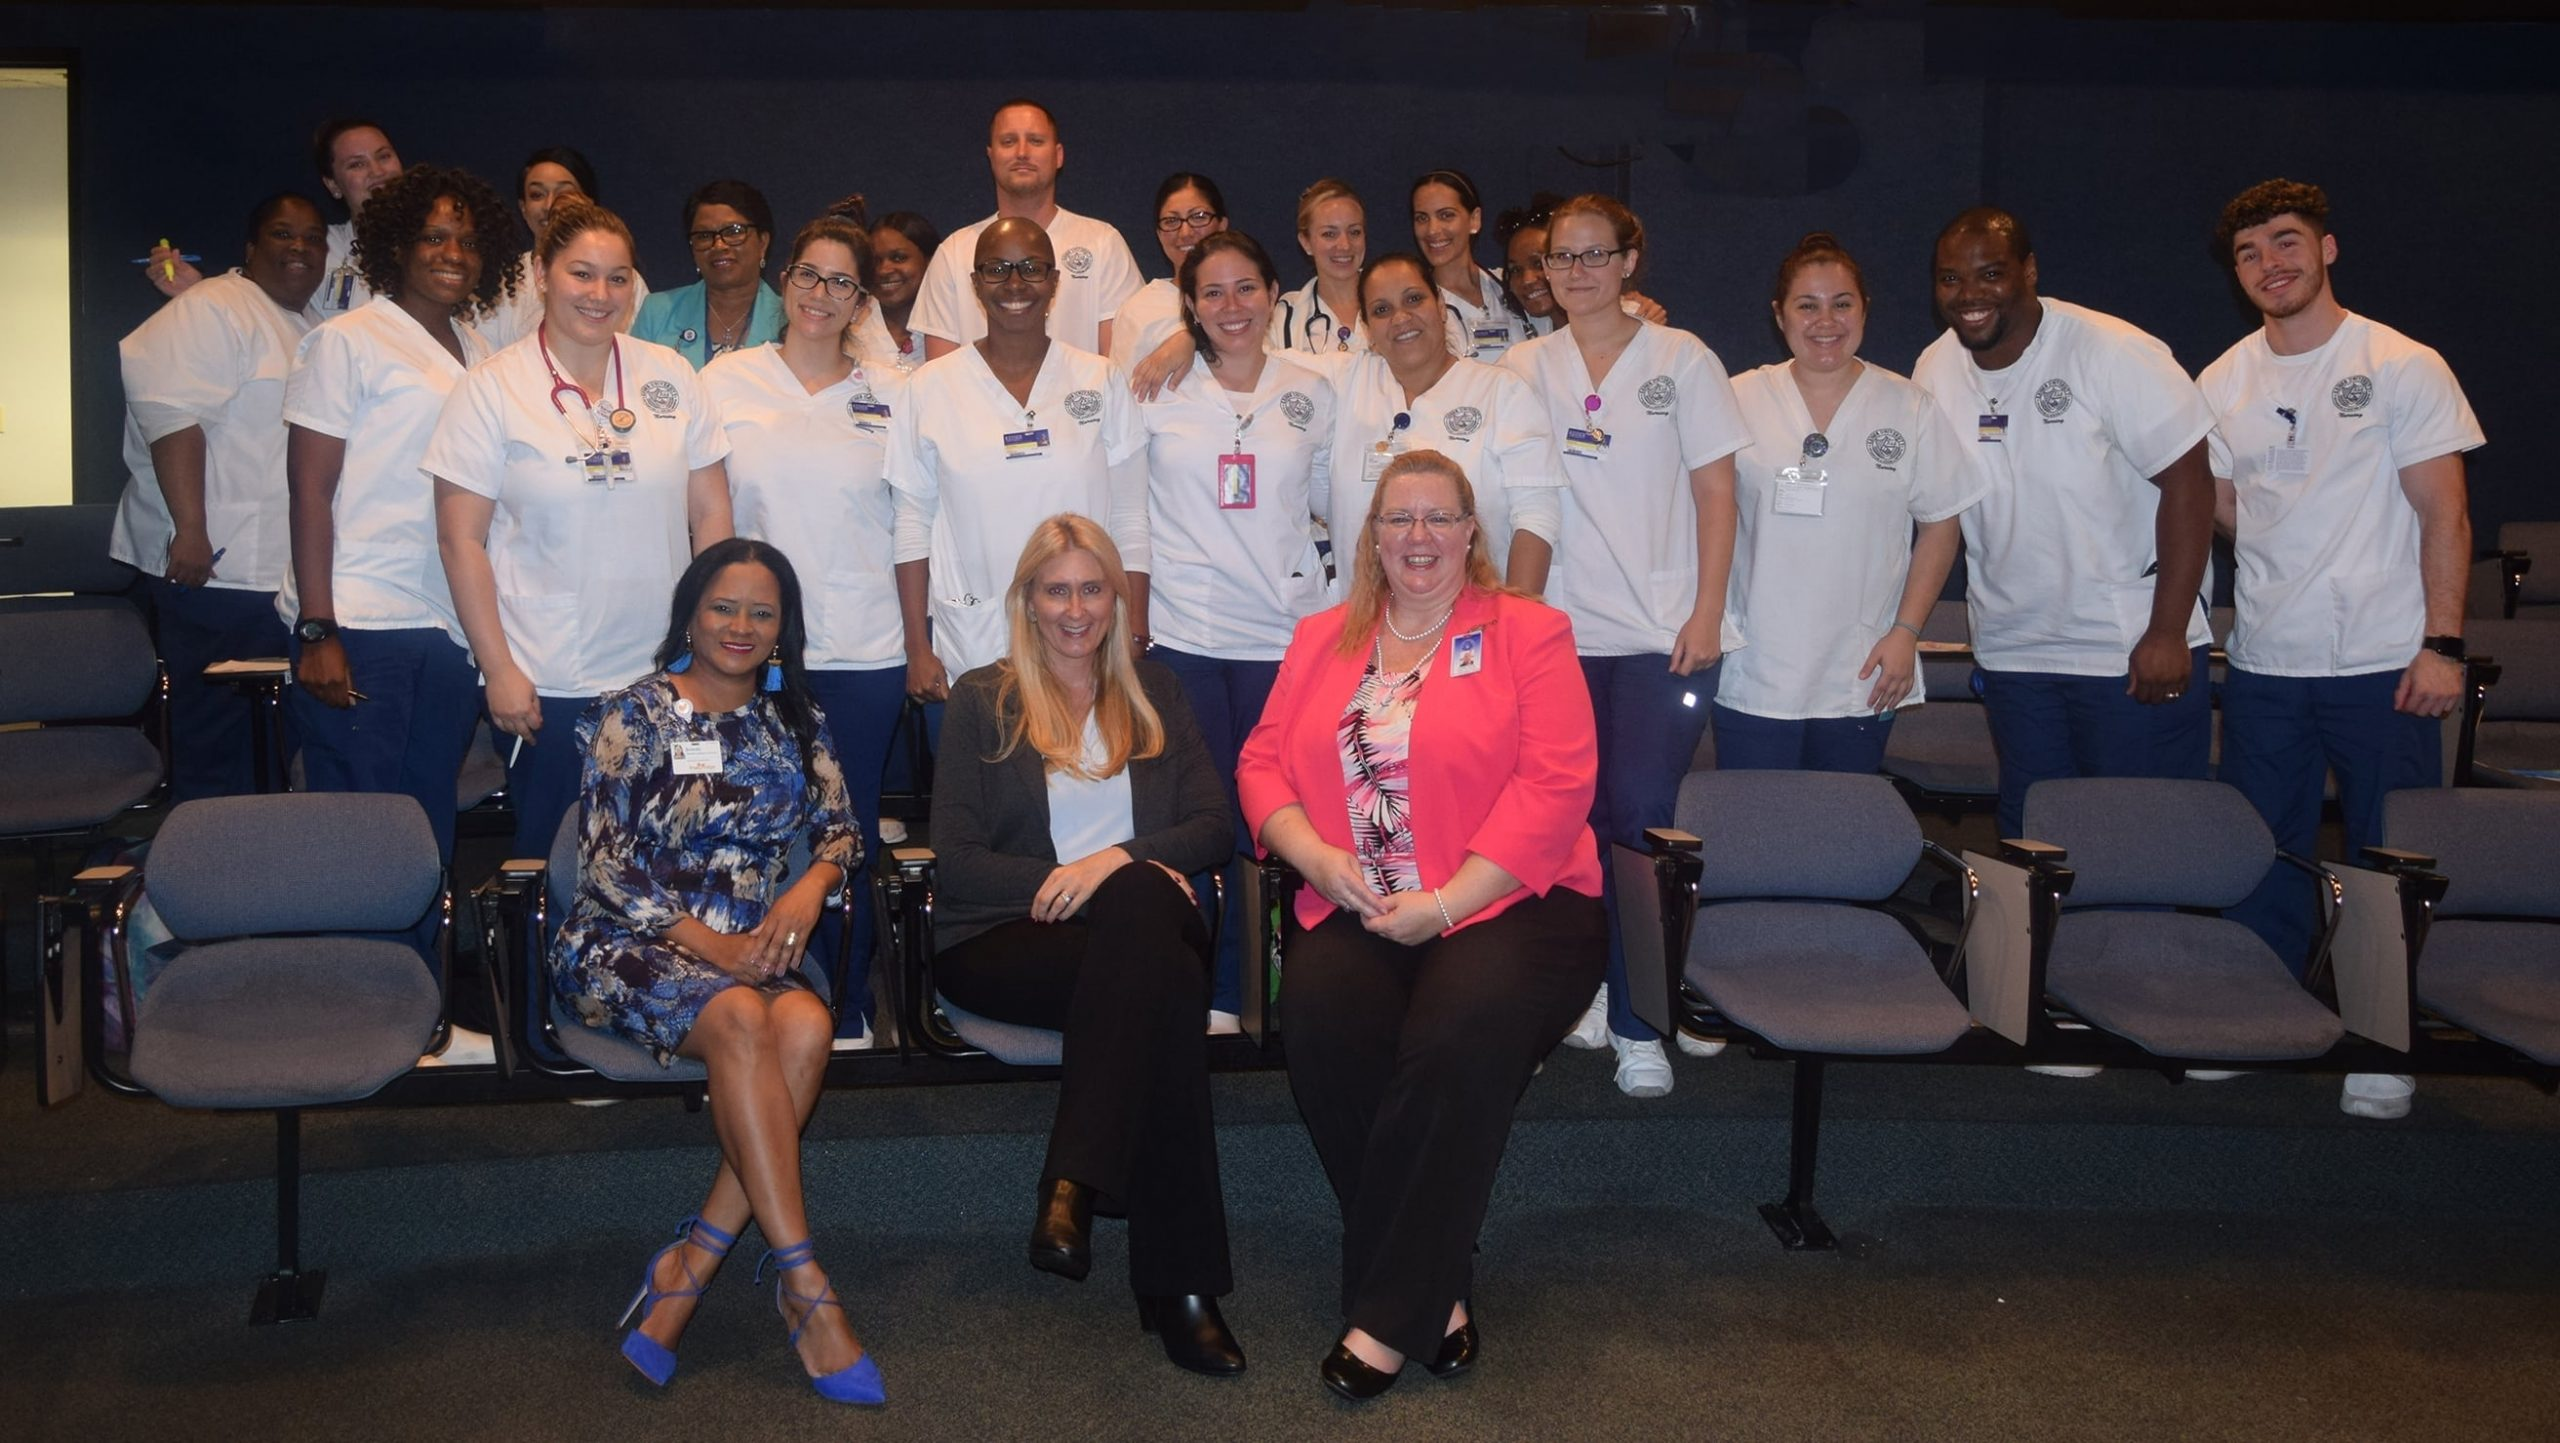 Fort Lauderdale Nursing Program Welcomes Trustbridge Class